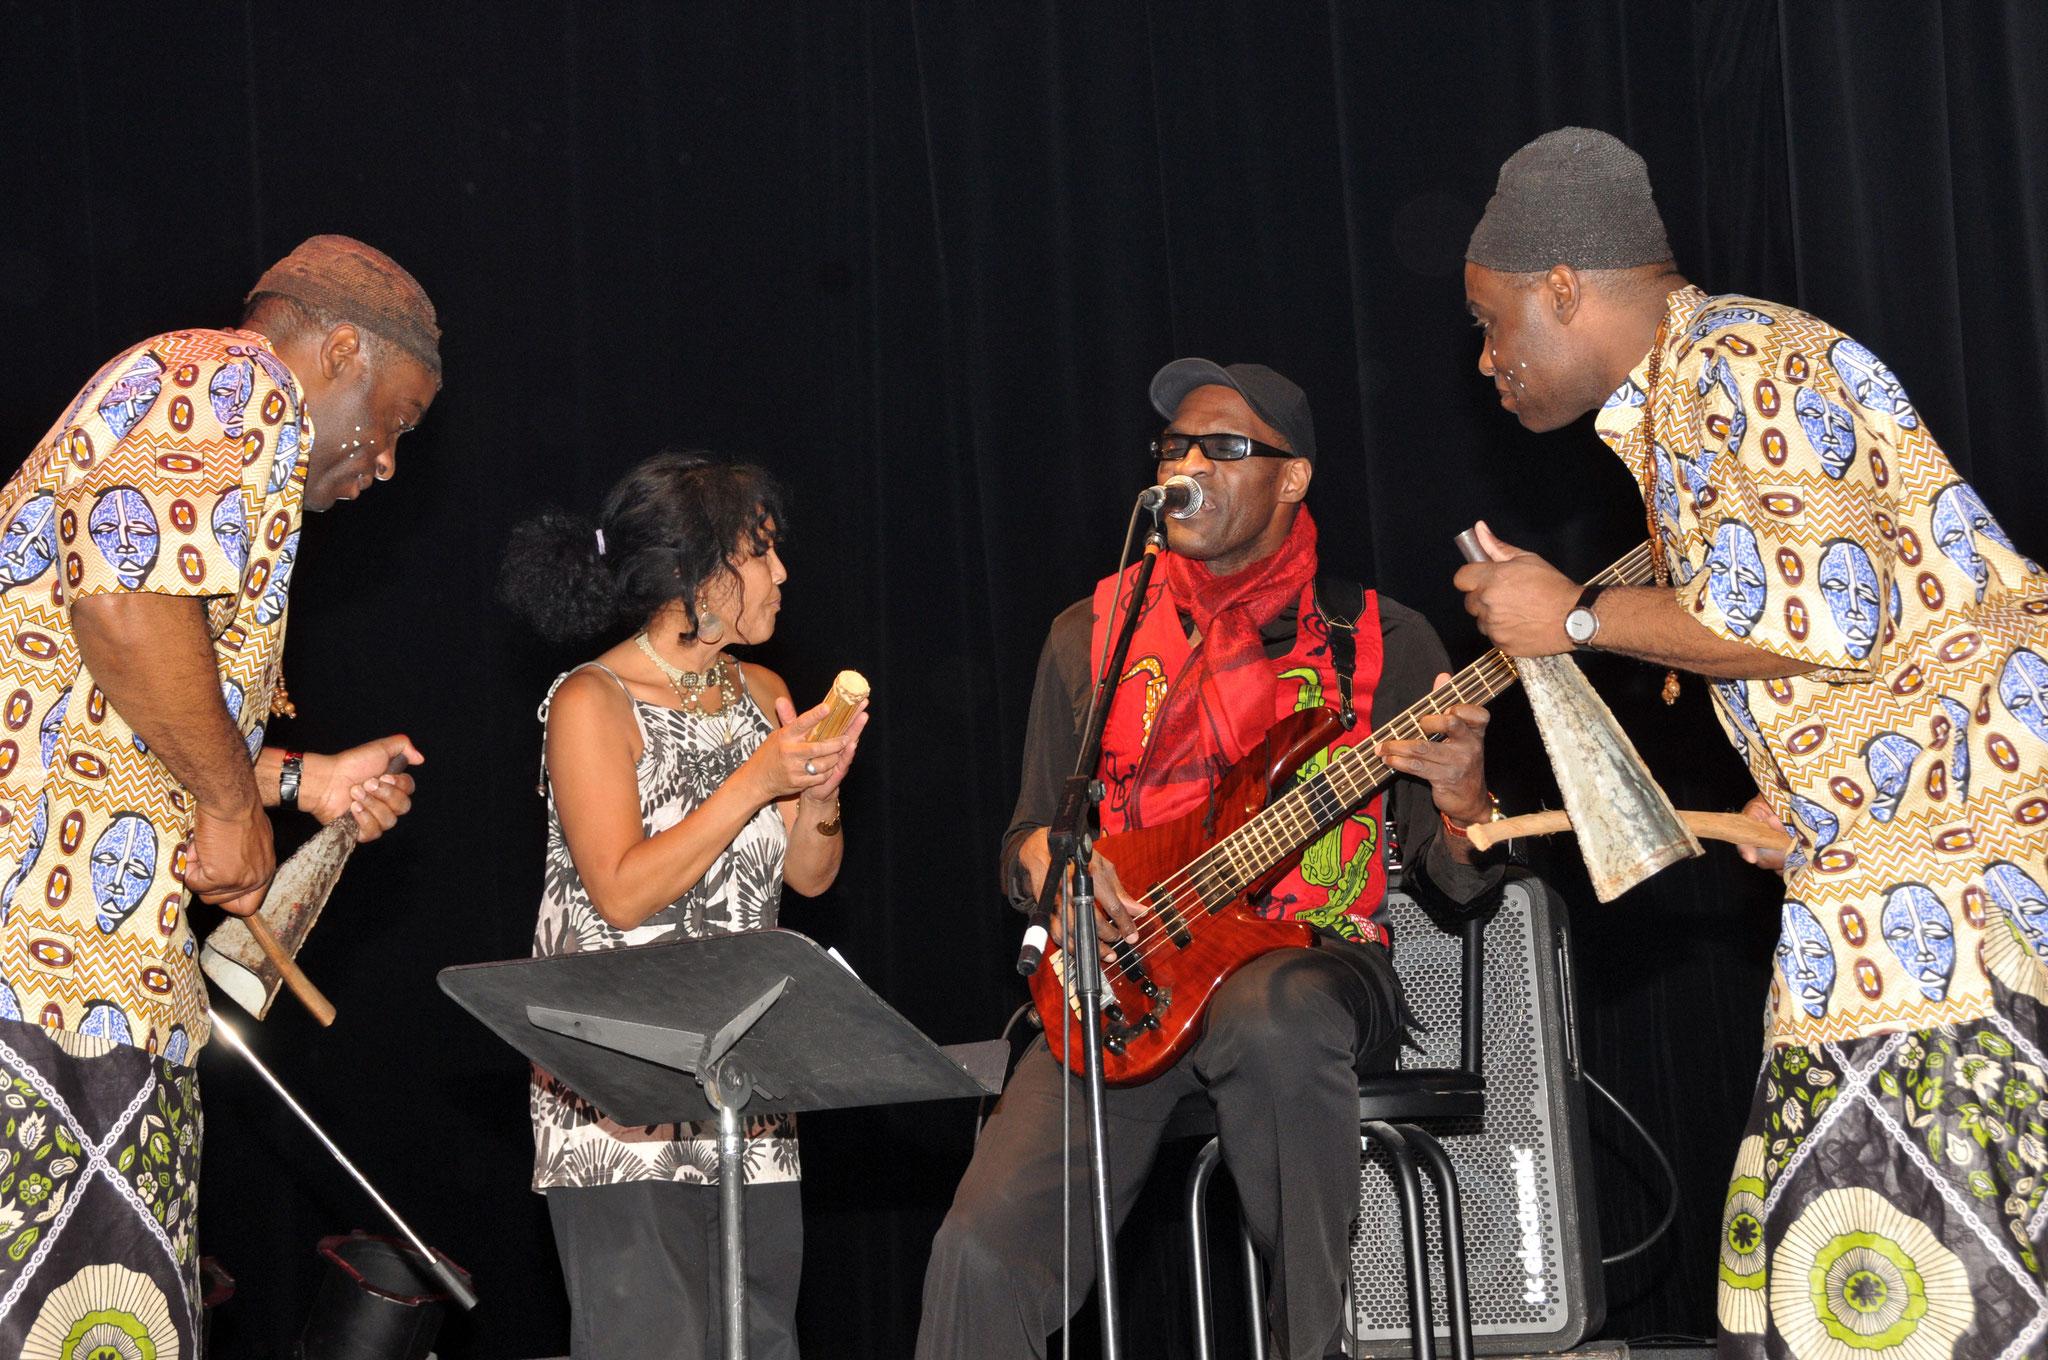 Les Jumeaux de MASAO (Masao Masu) avec la chanteuse Sha Rakotofiringa et  le bassiste Noël Ekwabiet.  Photo : Jean-Luc Karcher